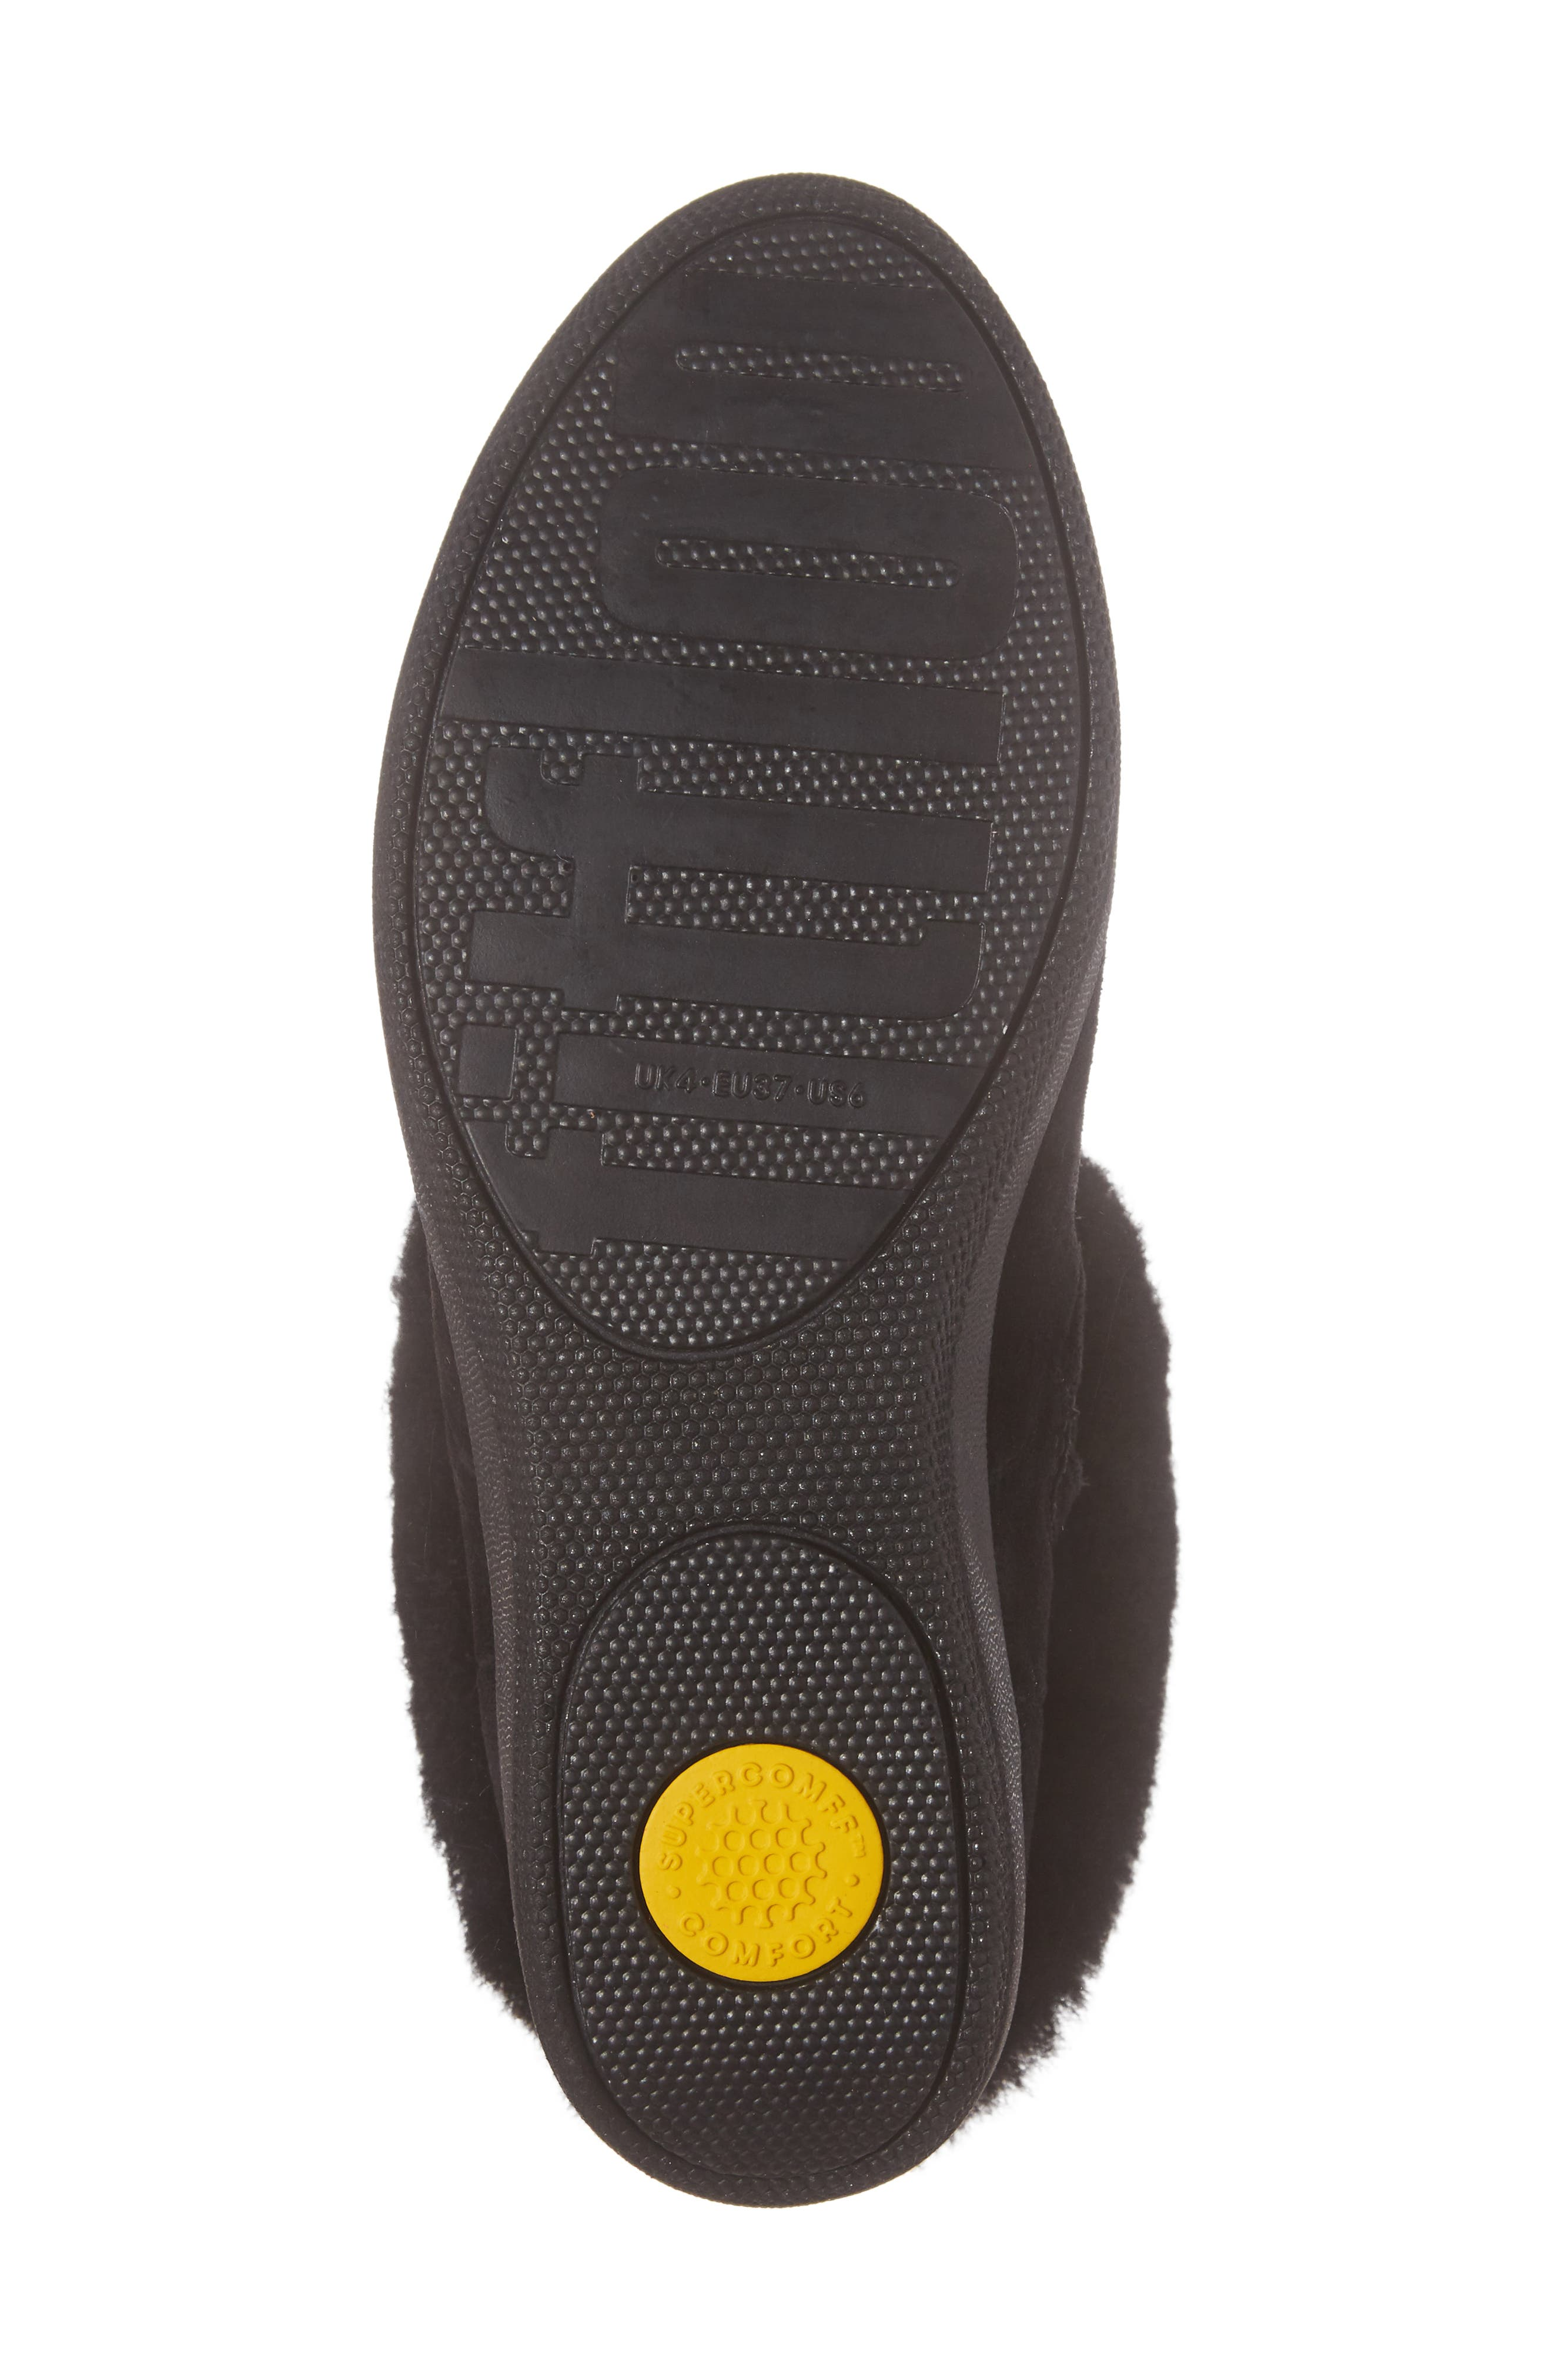 Skate Genuine Shearling Cuff Boot,                             Alternate thumbnail 6, color,                             001